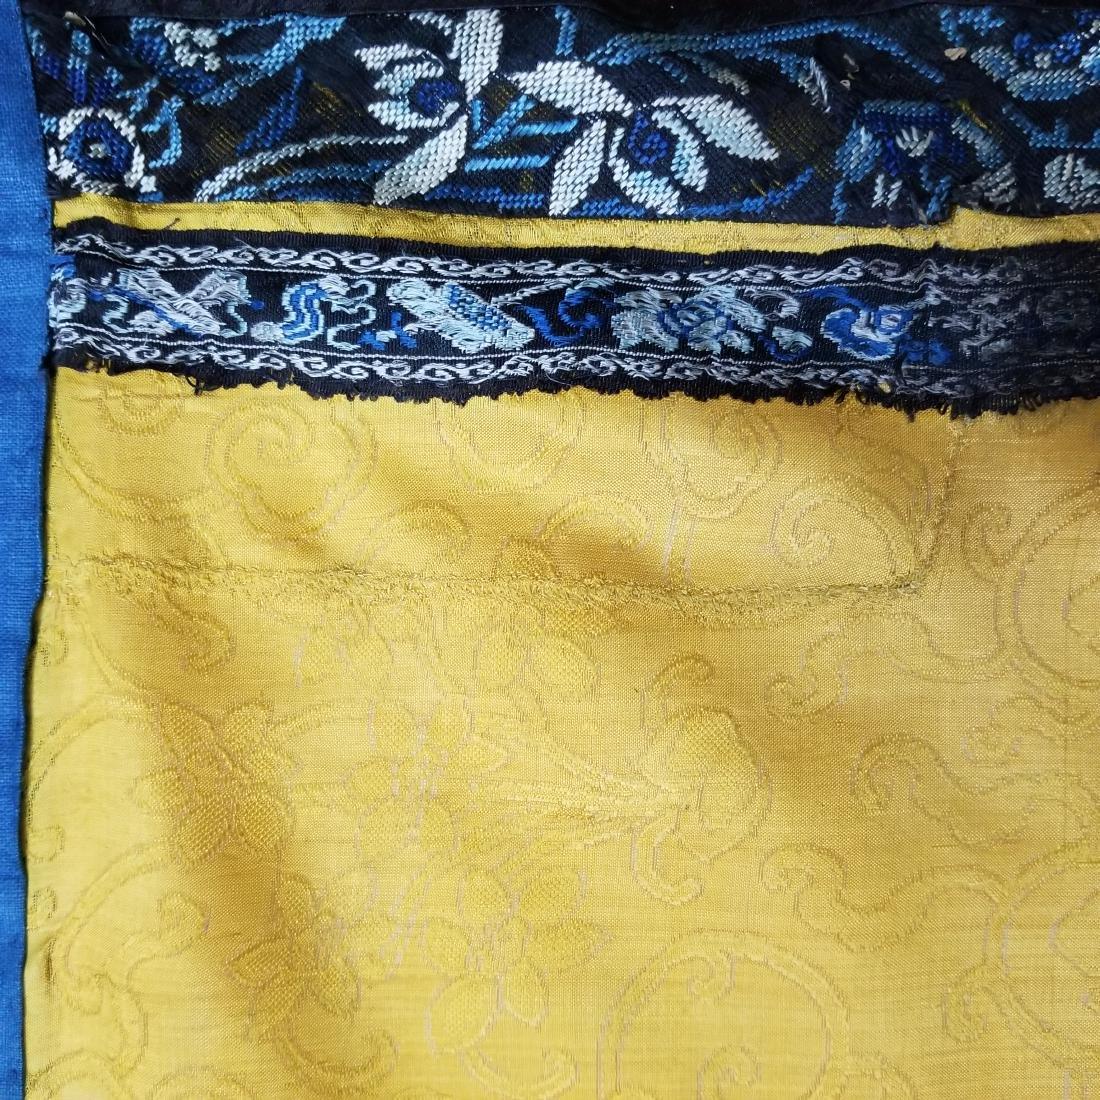 Antique Chinese Silk Hand Embroidered Skirt Forbidden - 8